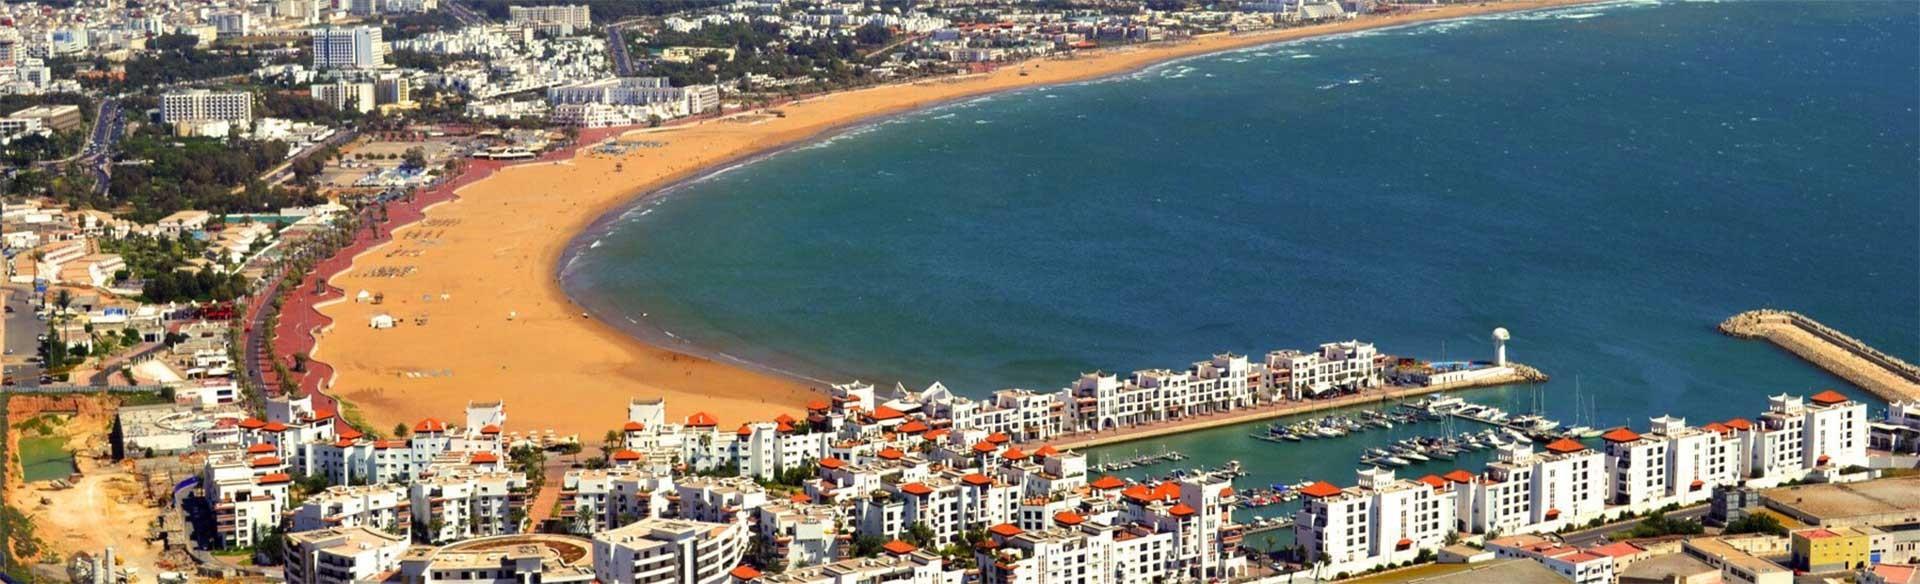 Агадир, Мароко